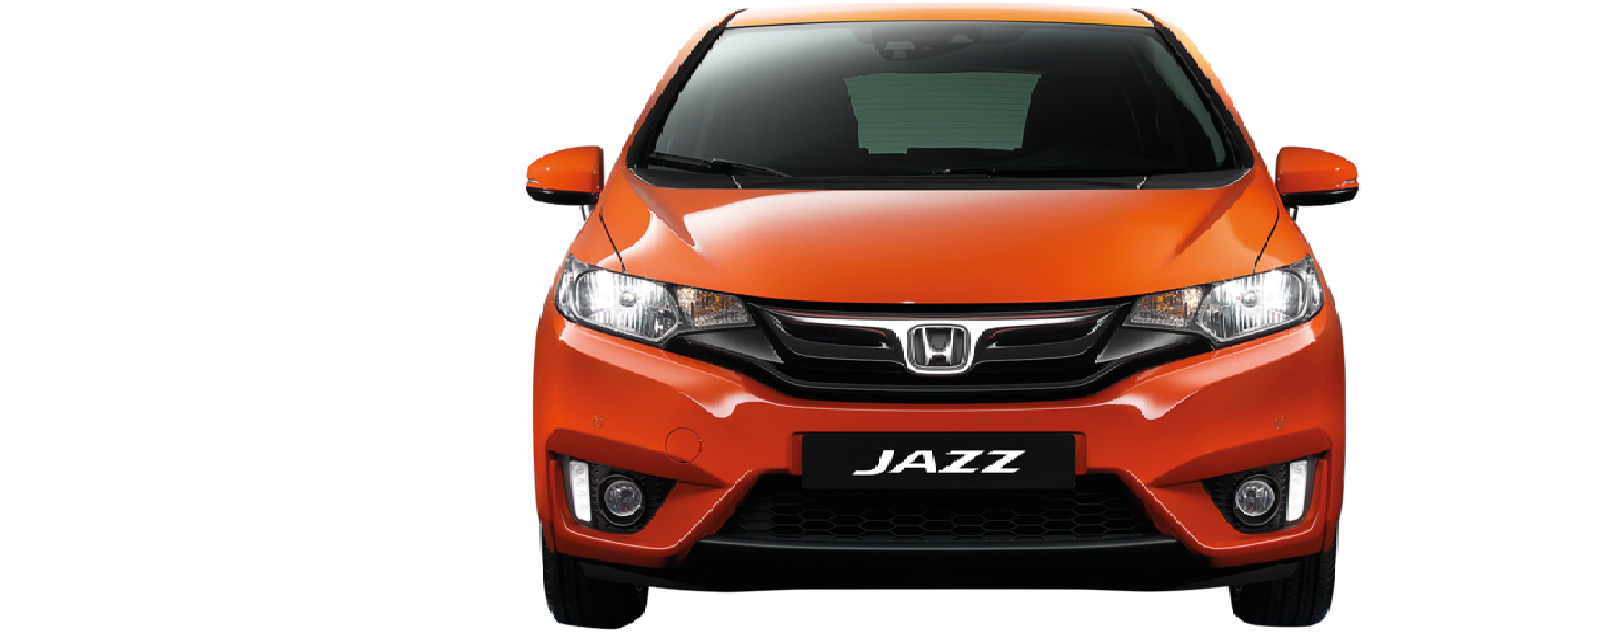 Kekurangan Harga Mobil Honda Jazz Harga